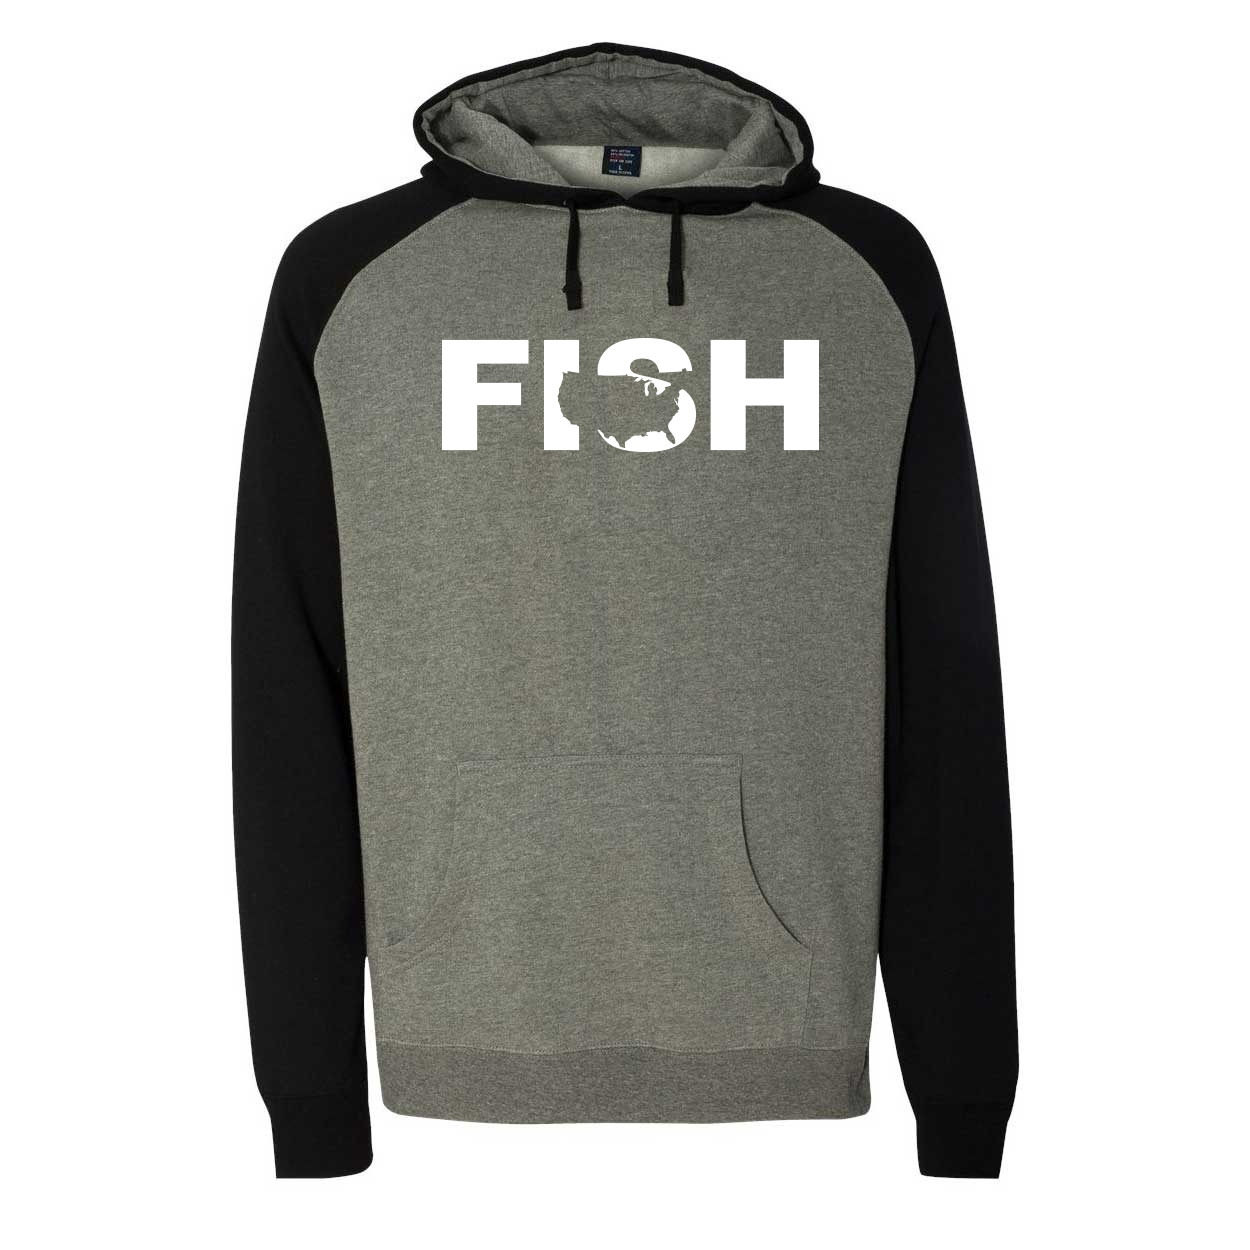 Fish United States Classic Raglan Hooded Pullover Sweatshirt Gunmetal/Heather Black (White Logo)